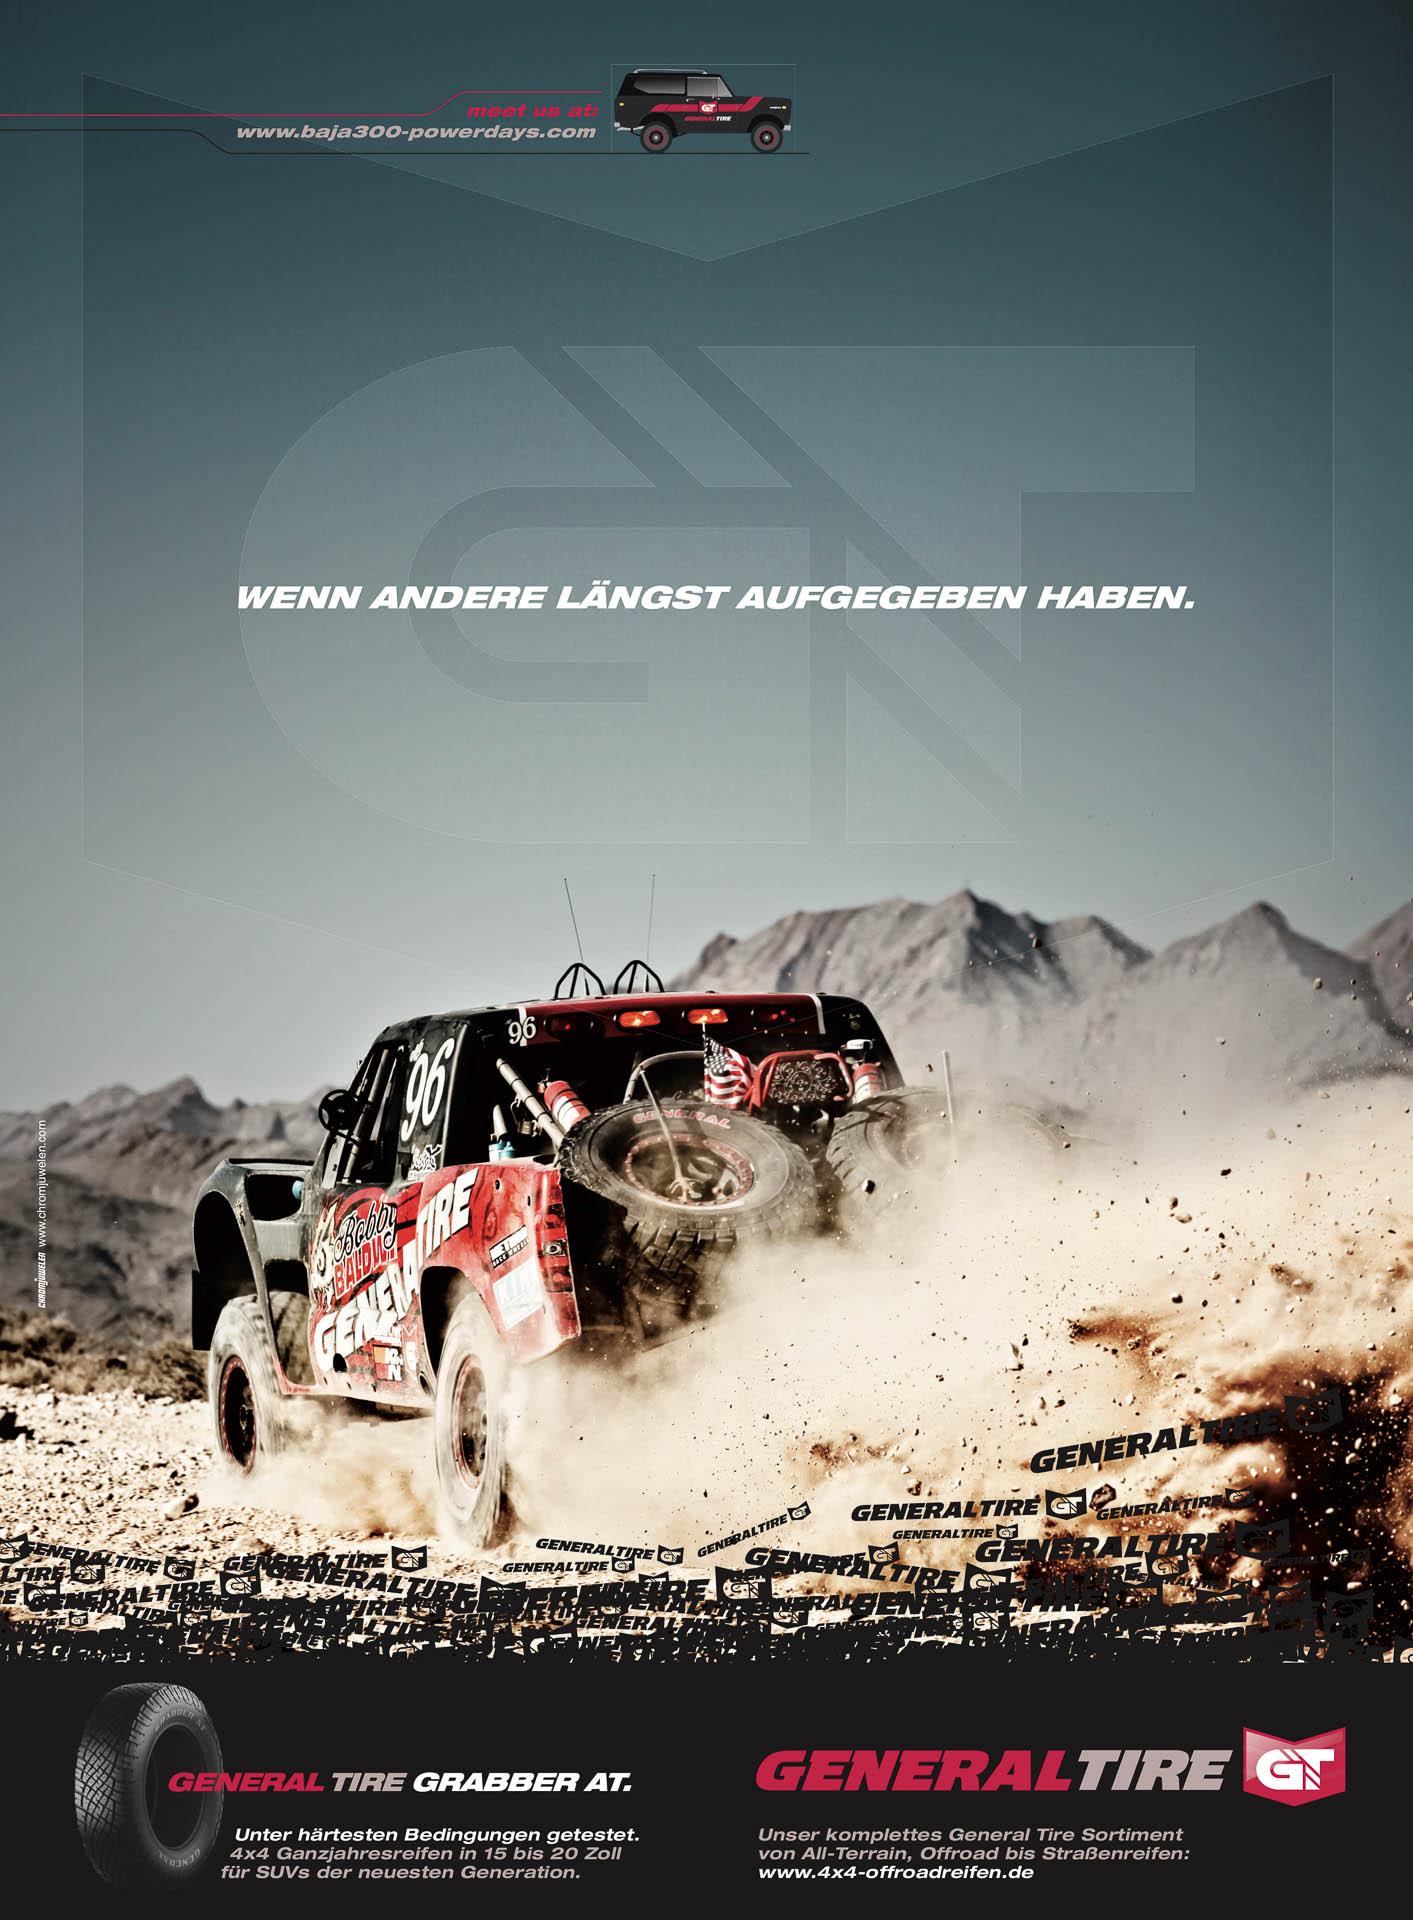 bcckcr-General-Tire-Ad_001.jpg